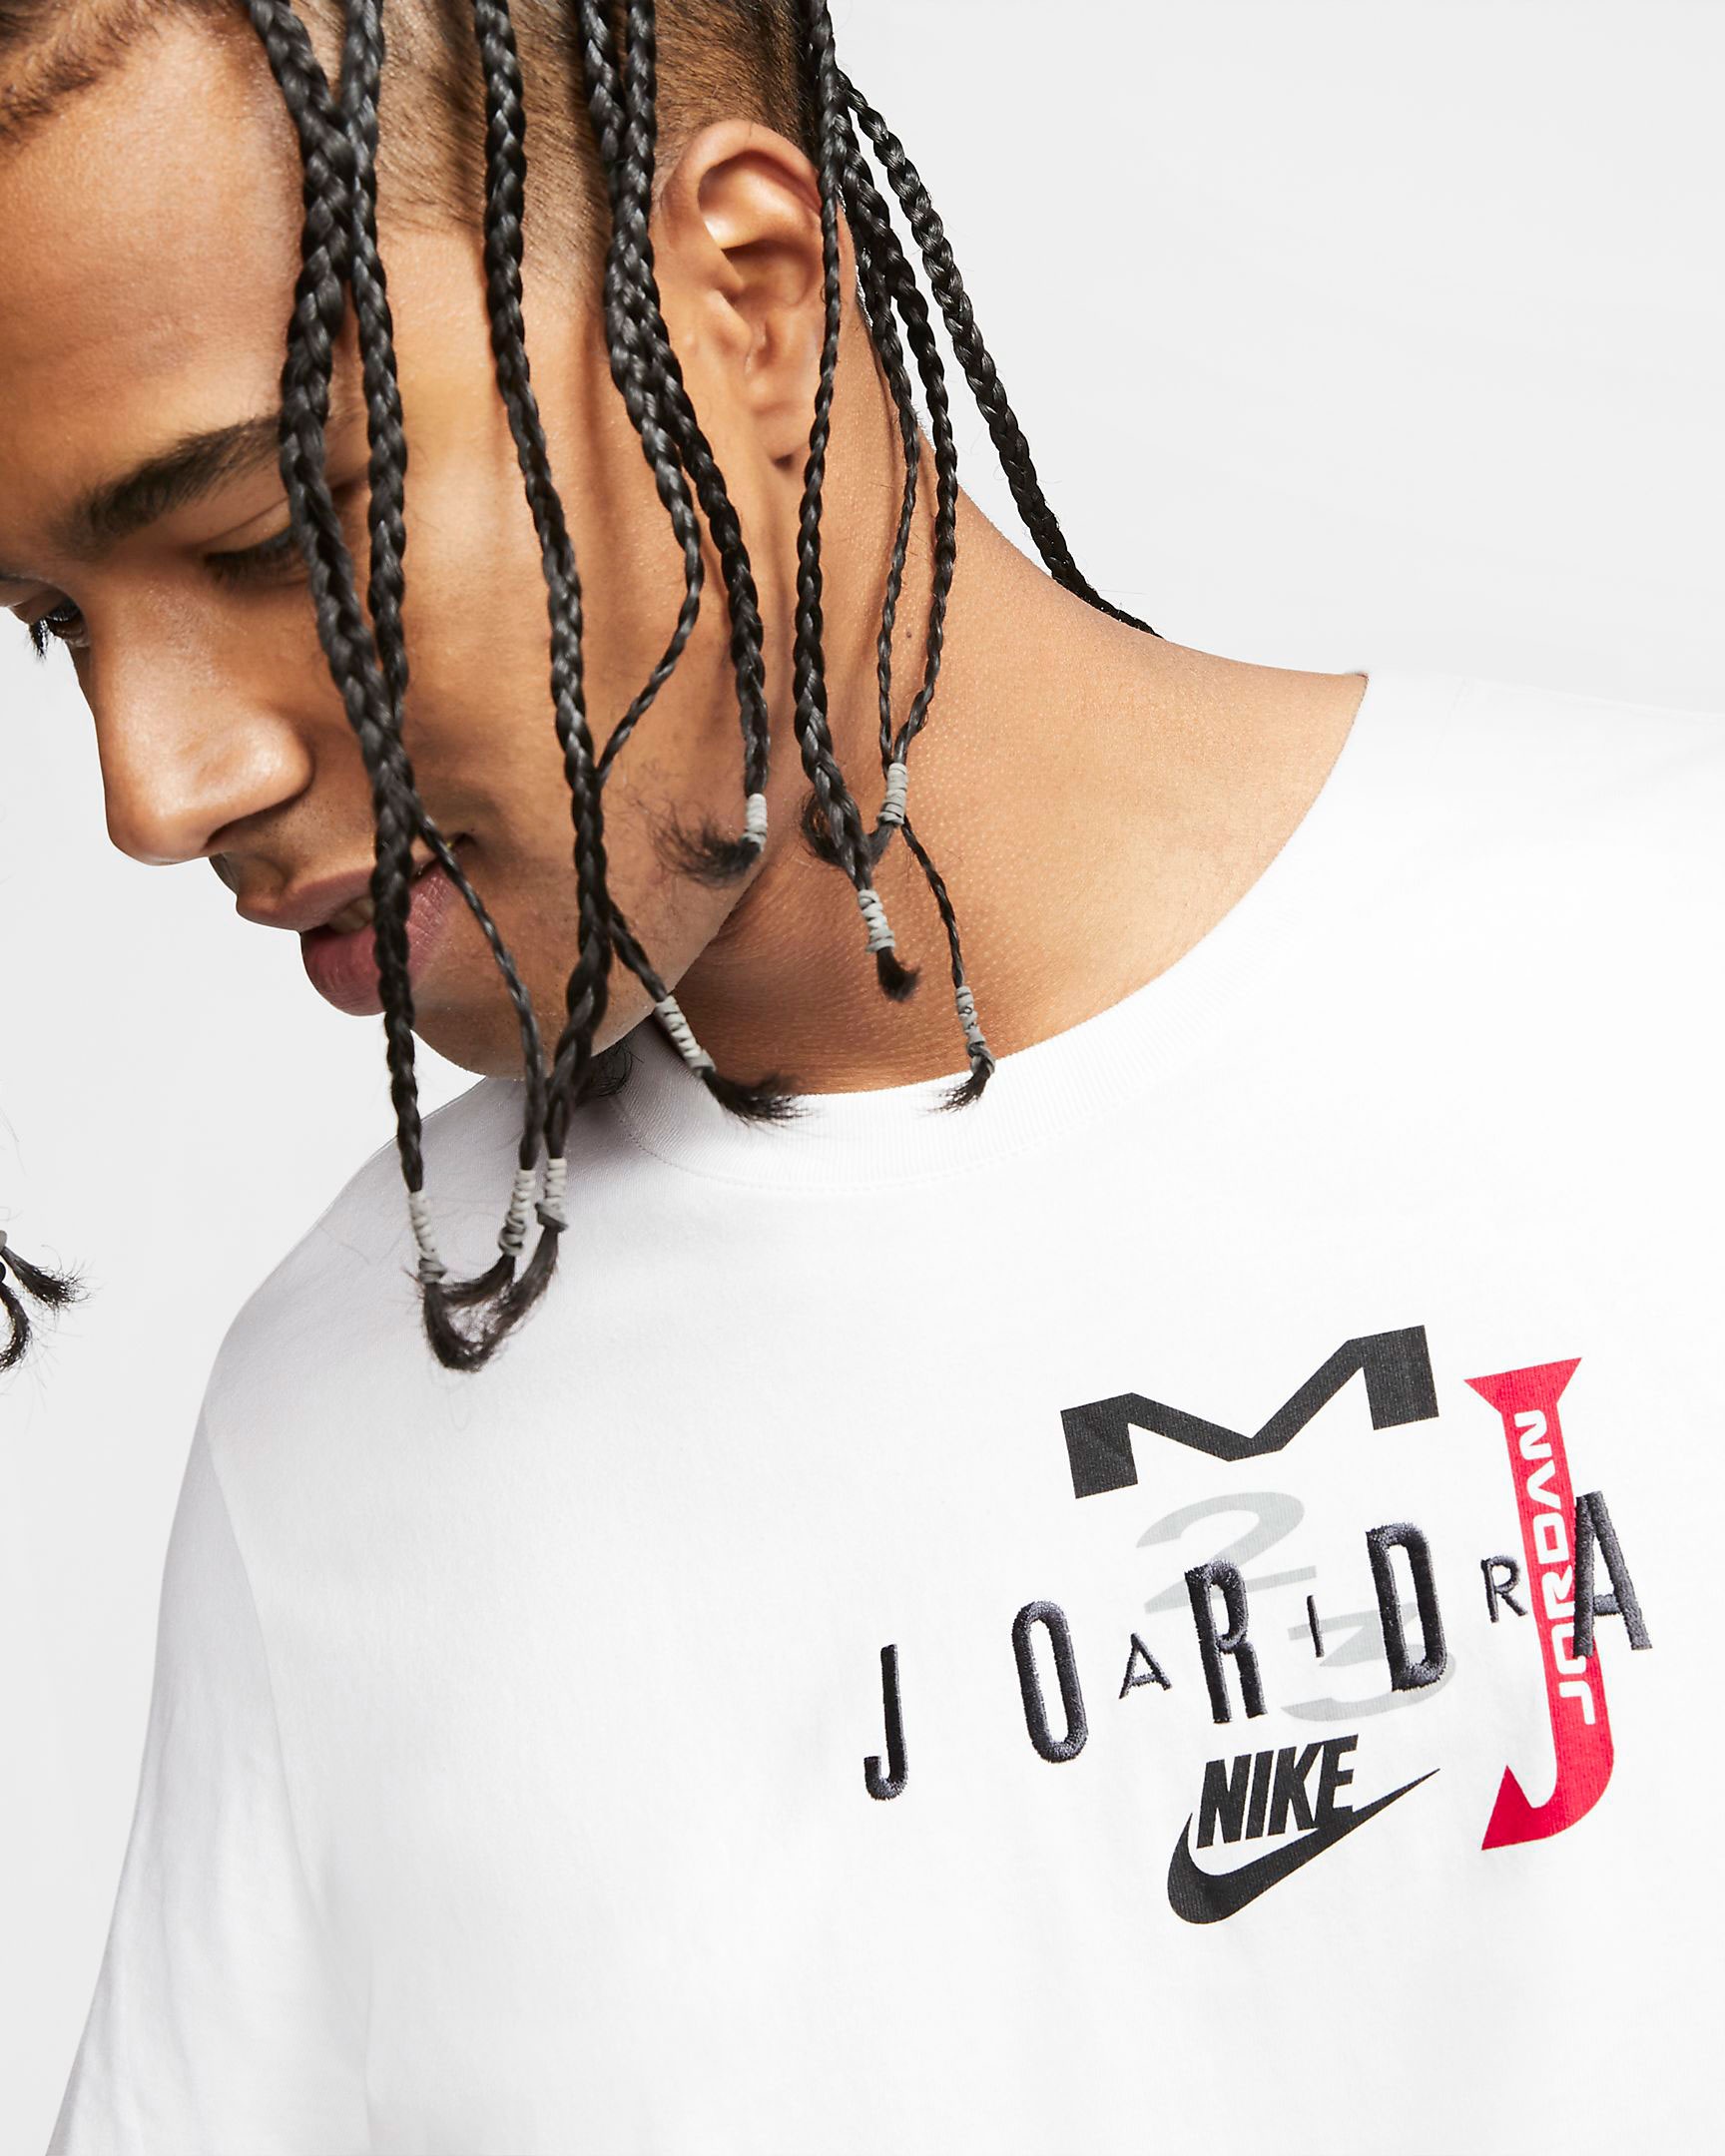 hare-jordan-6-shirt-match-3